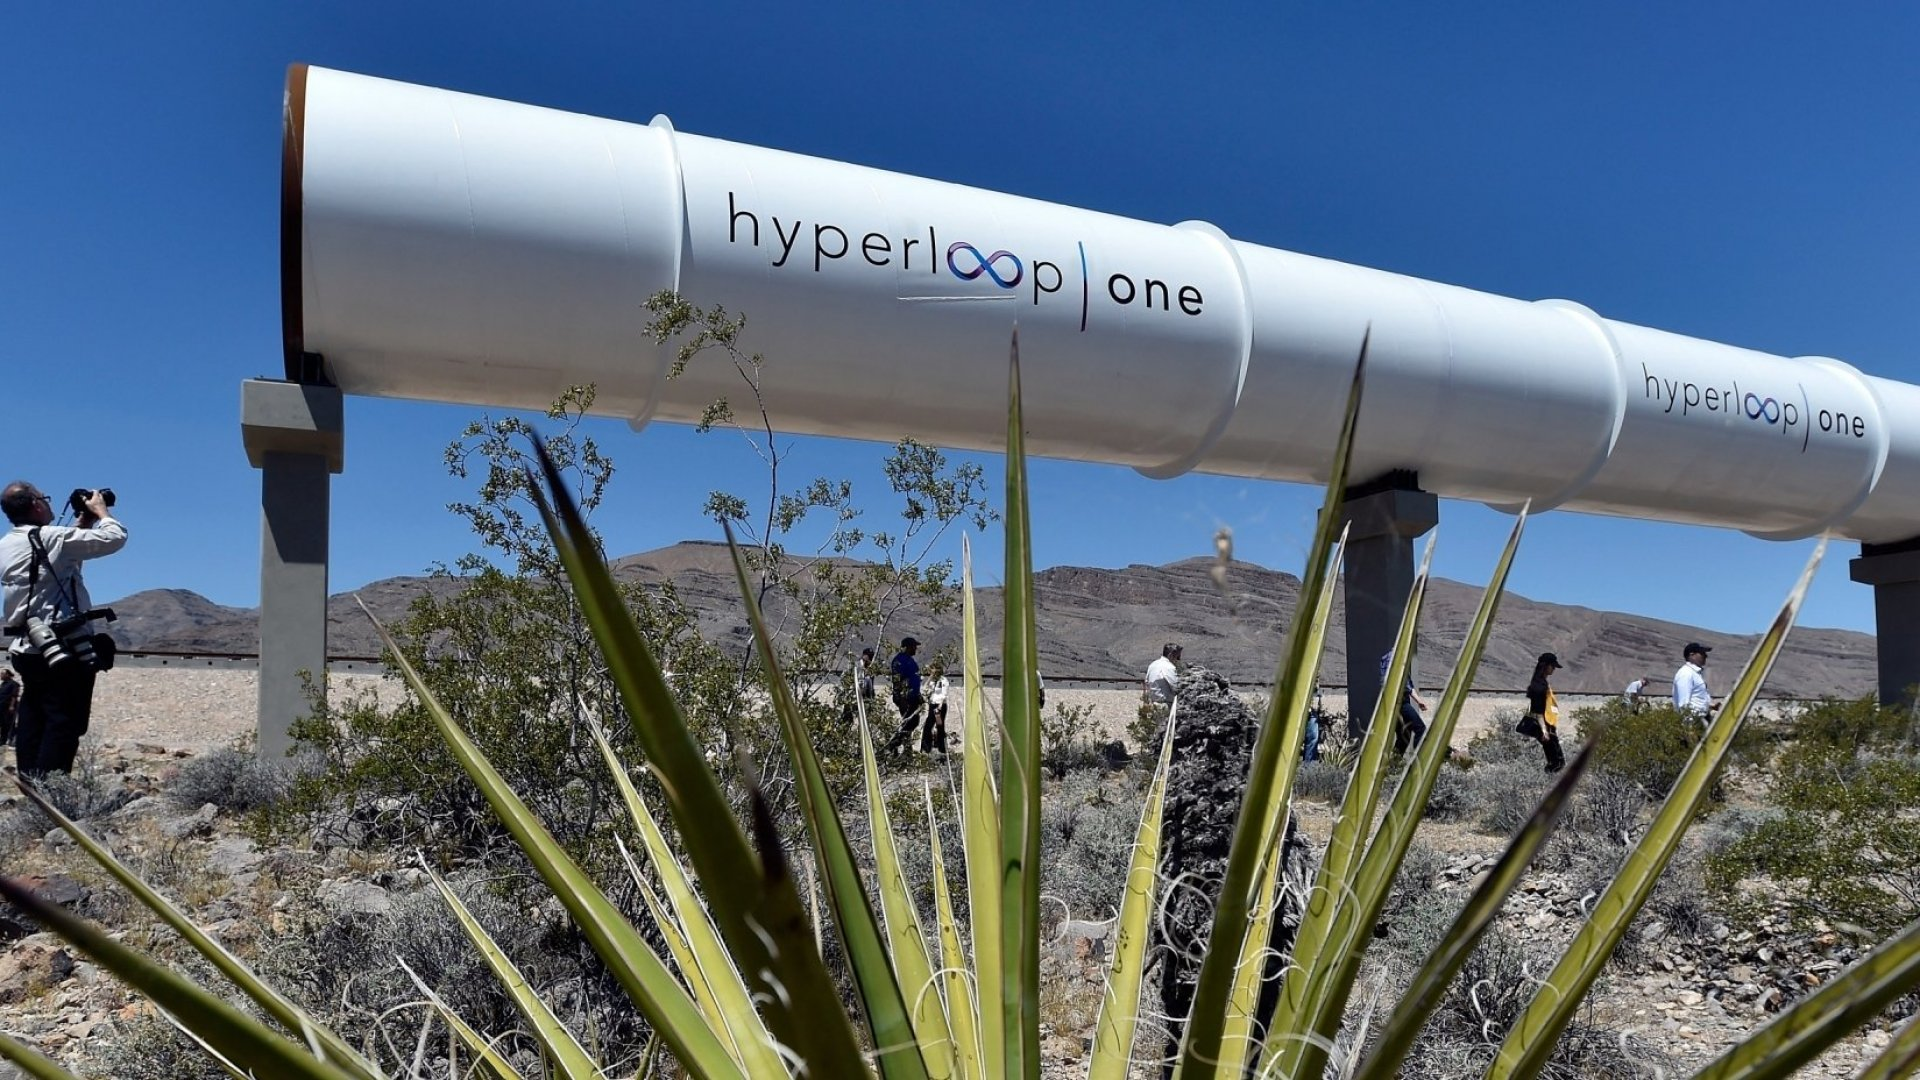 Hyperloop One's test site in Nevada.